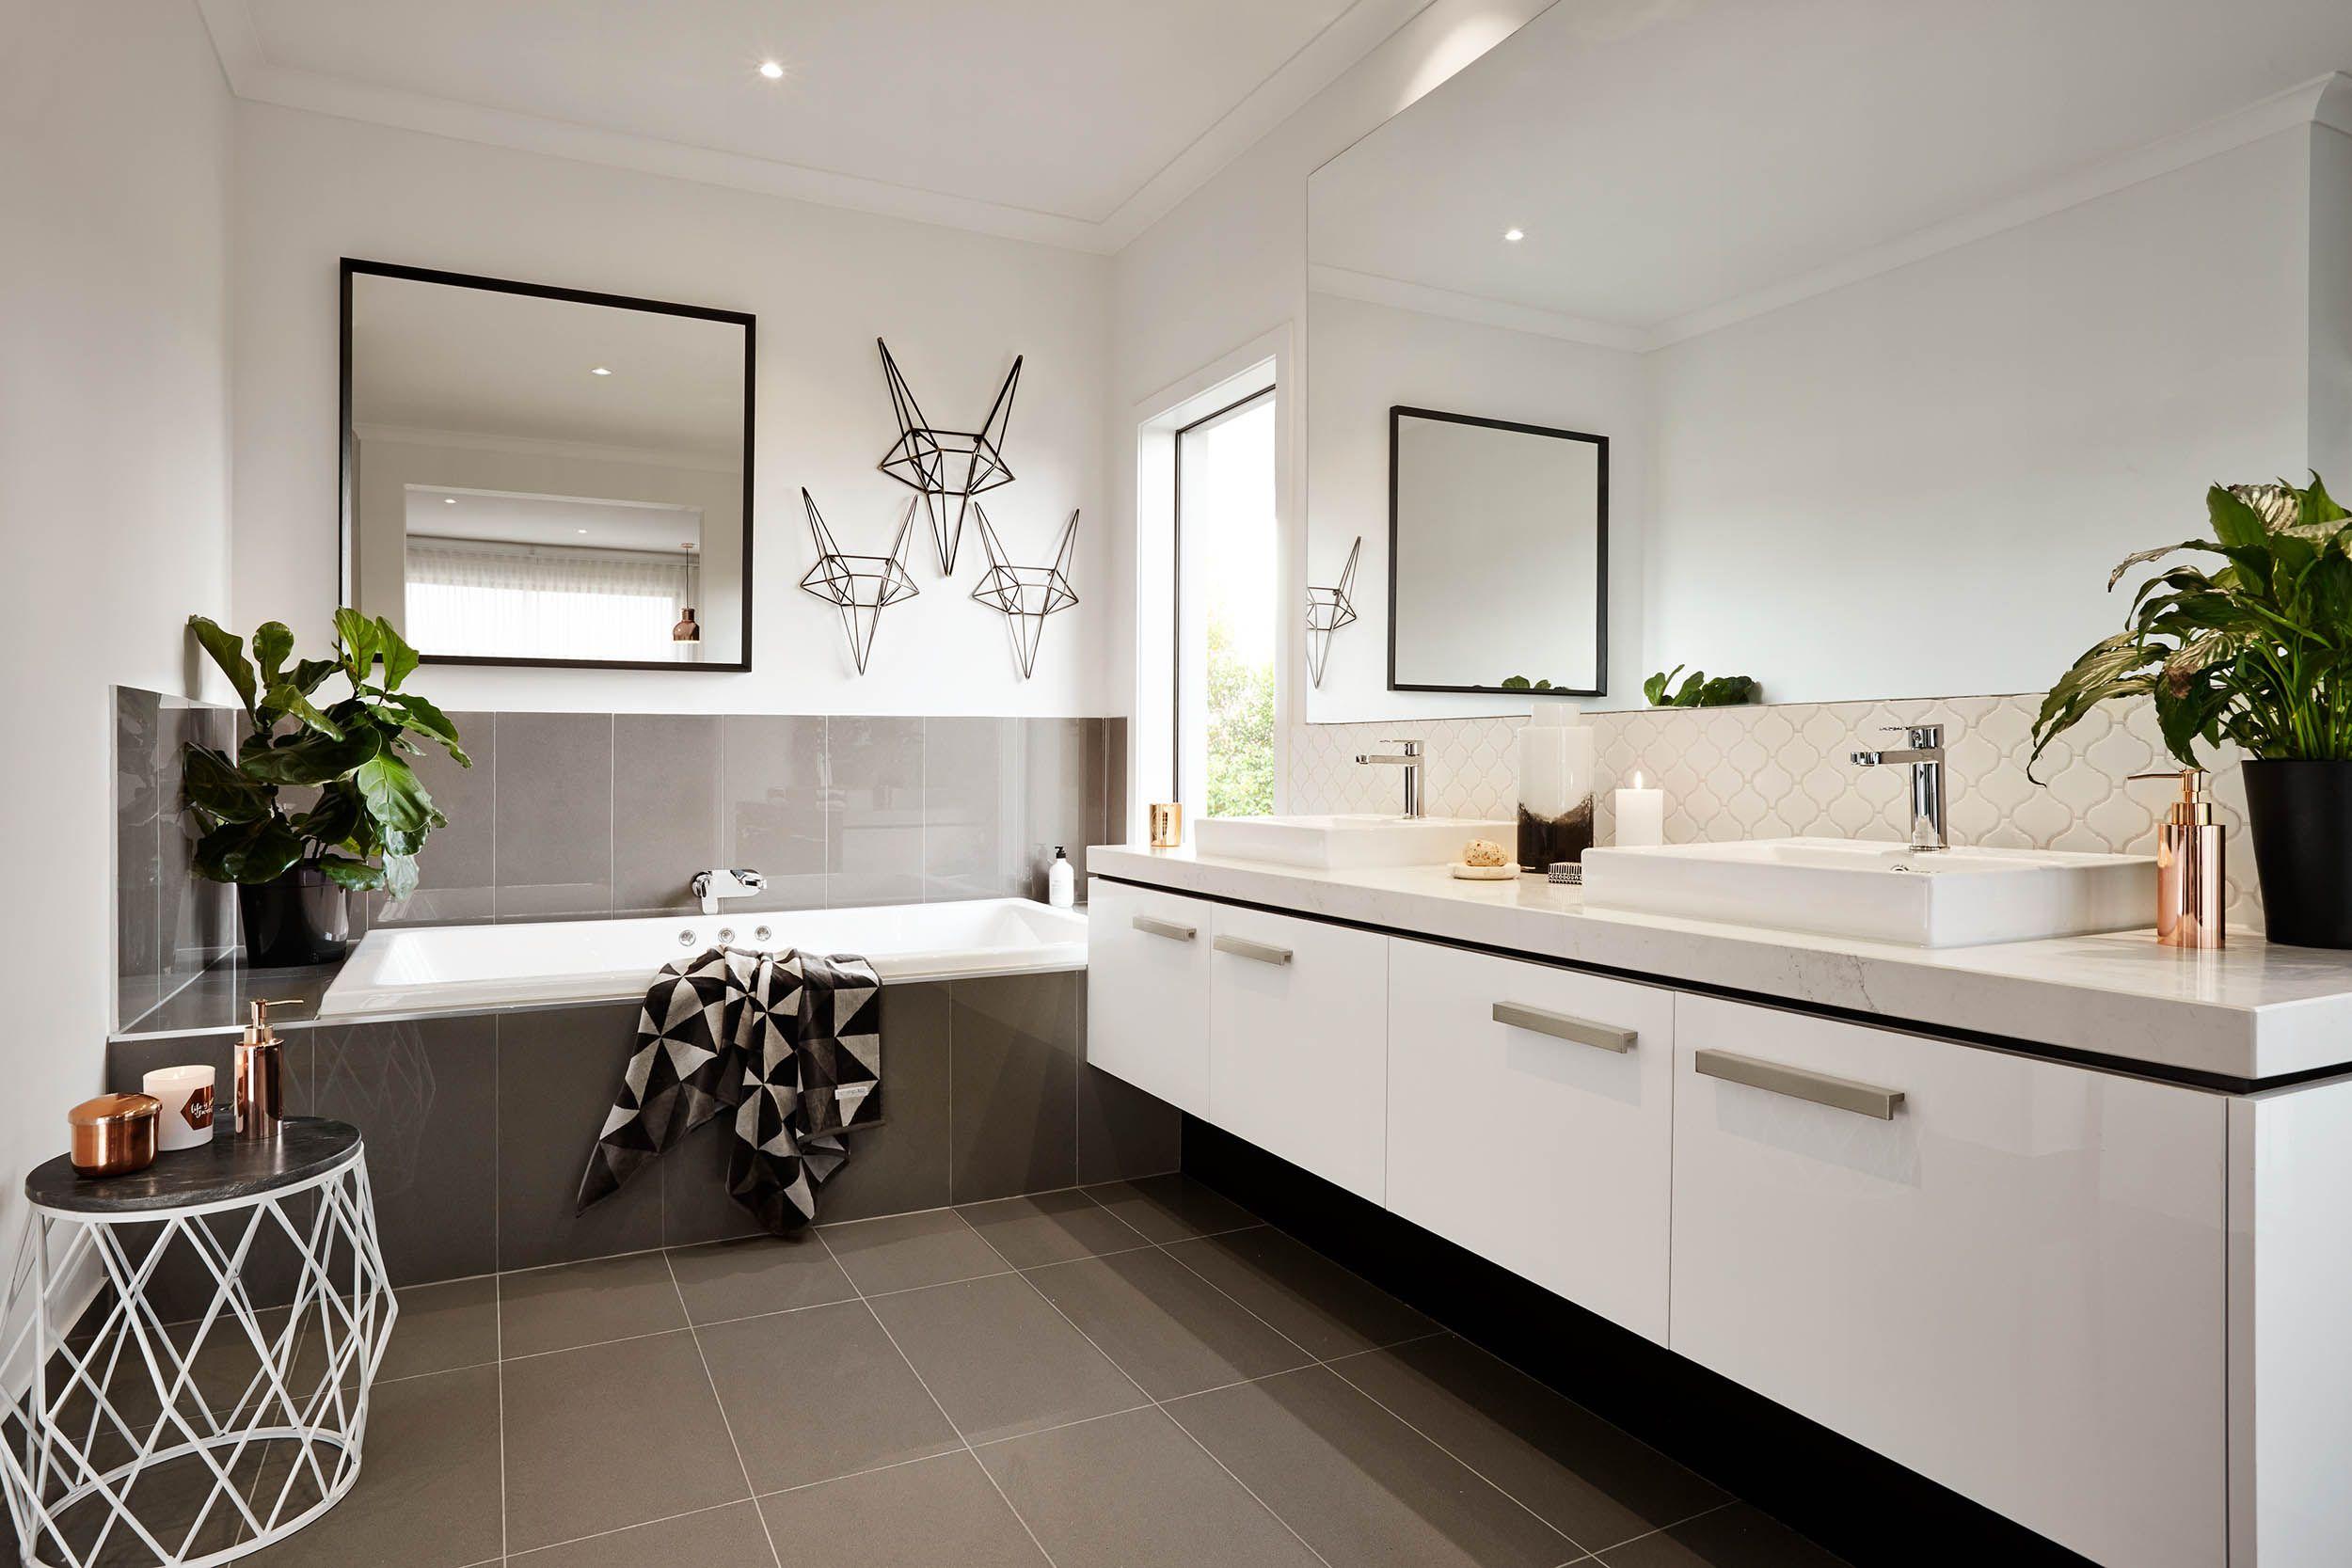 Bathroom Renovations Sunbury carlisle homes: regent 33 - featured at rosenthal estate